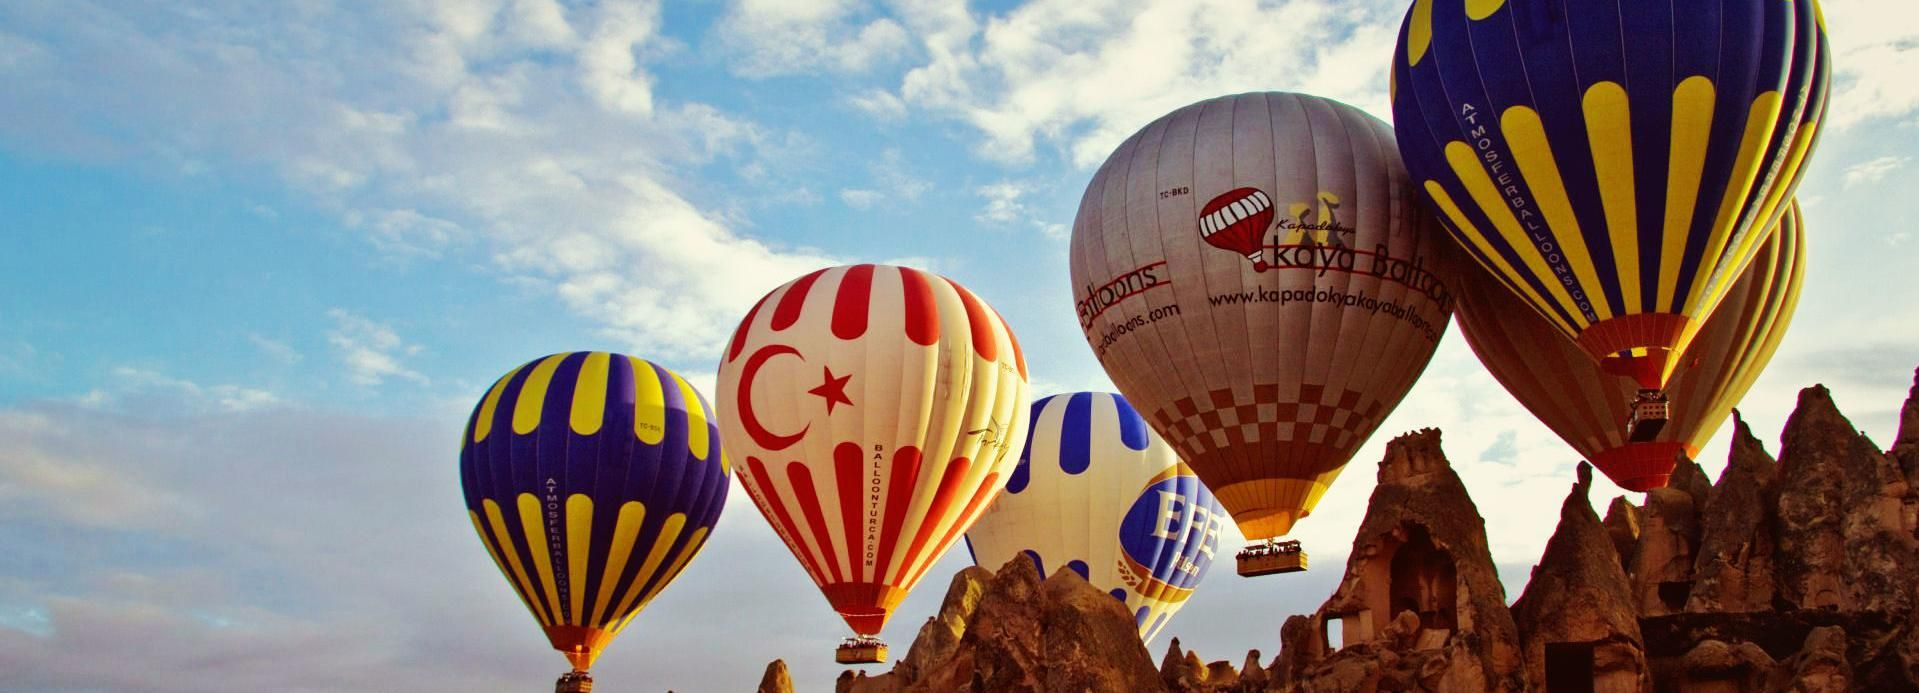 Cappadocia to Konya, Pamukkale and Ephesus Tour